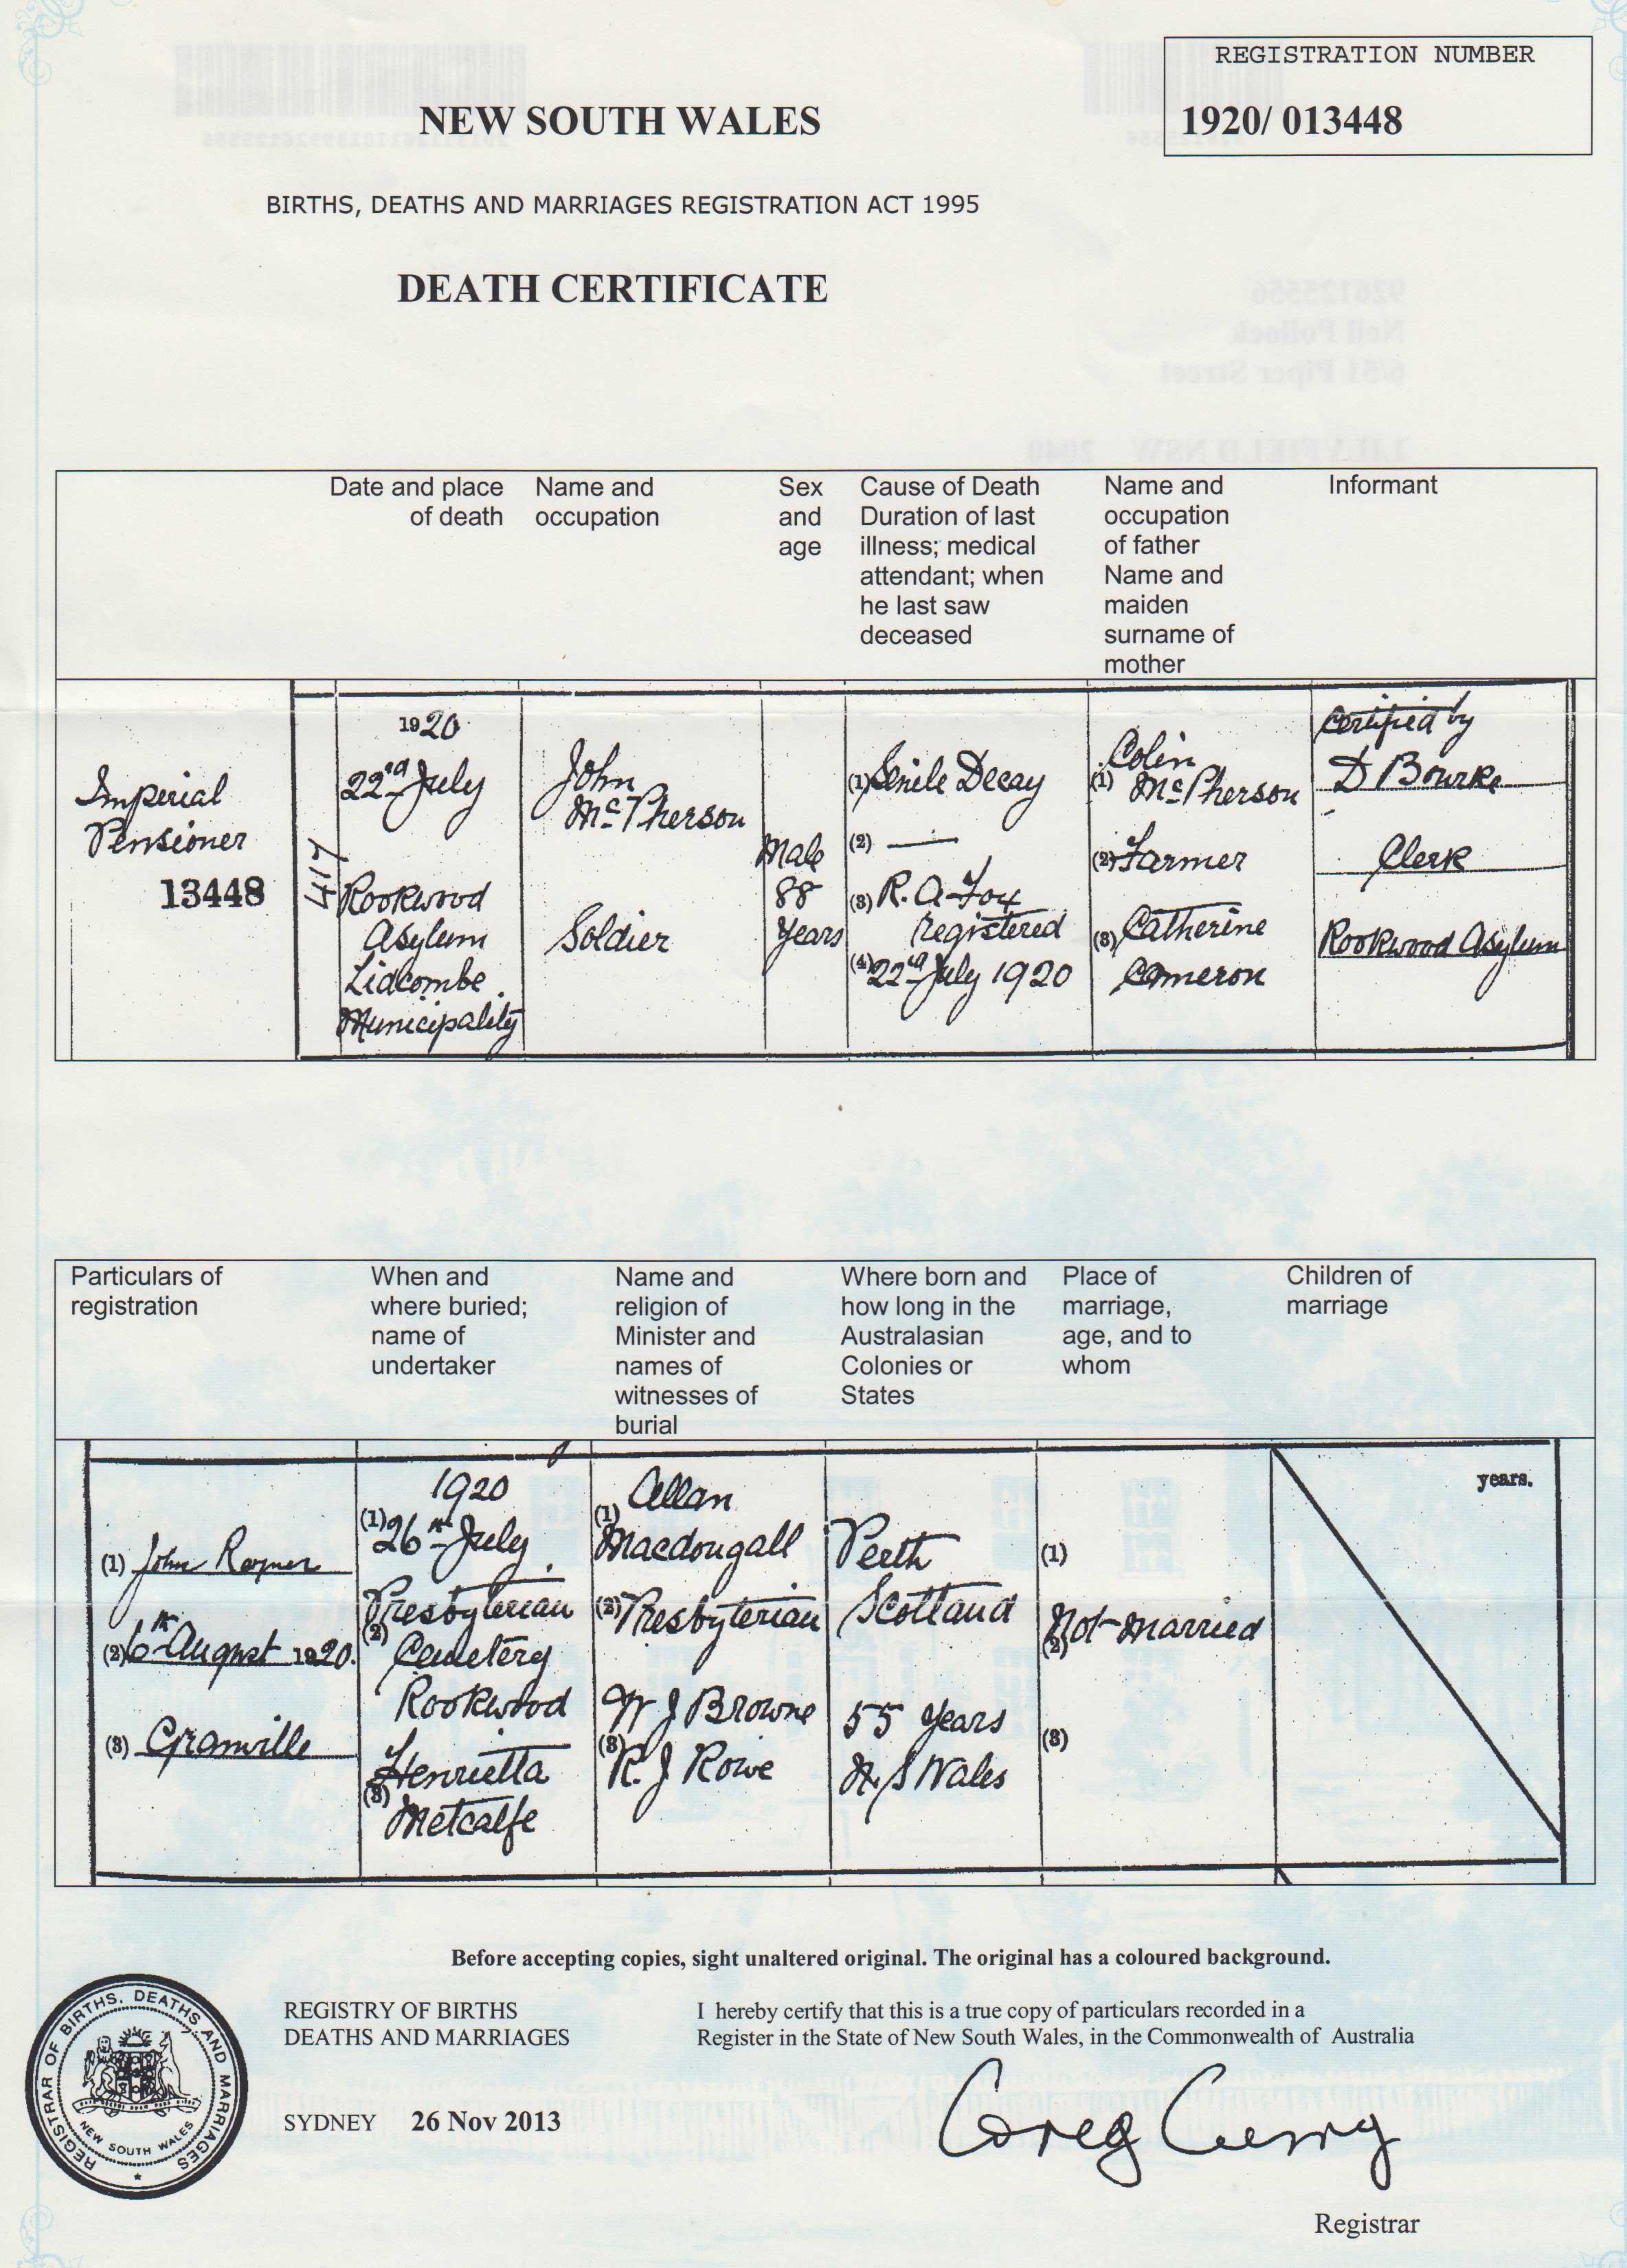 John McPherson death certificate